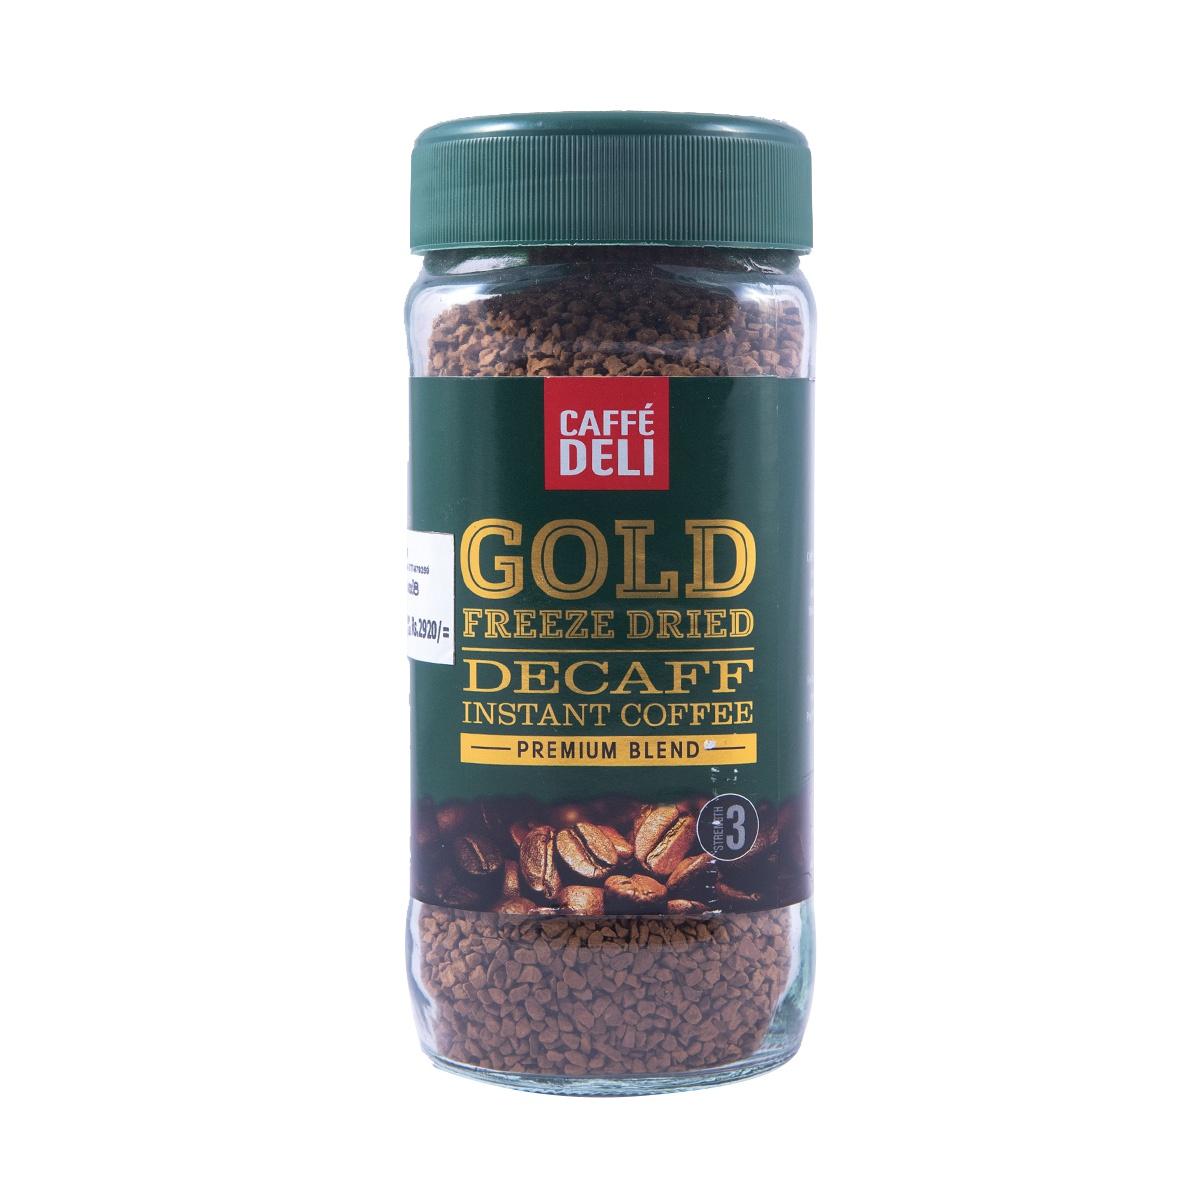 Caffe Deli Gold Instant Coffee 190g - in Sri Lanka